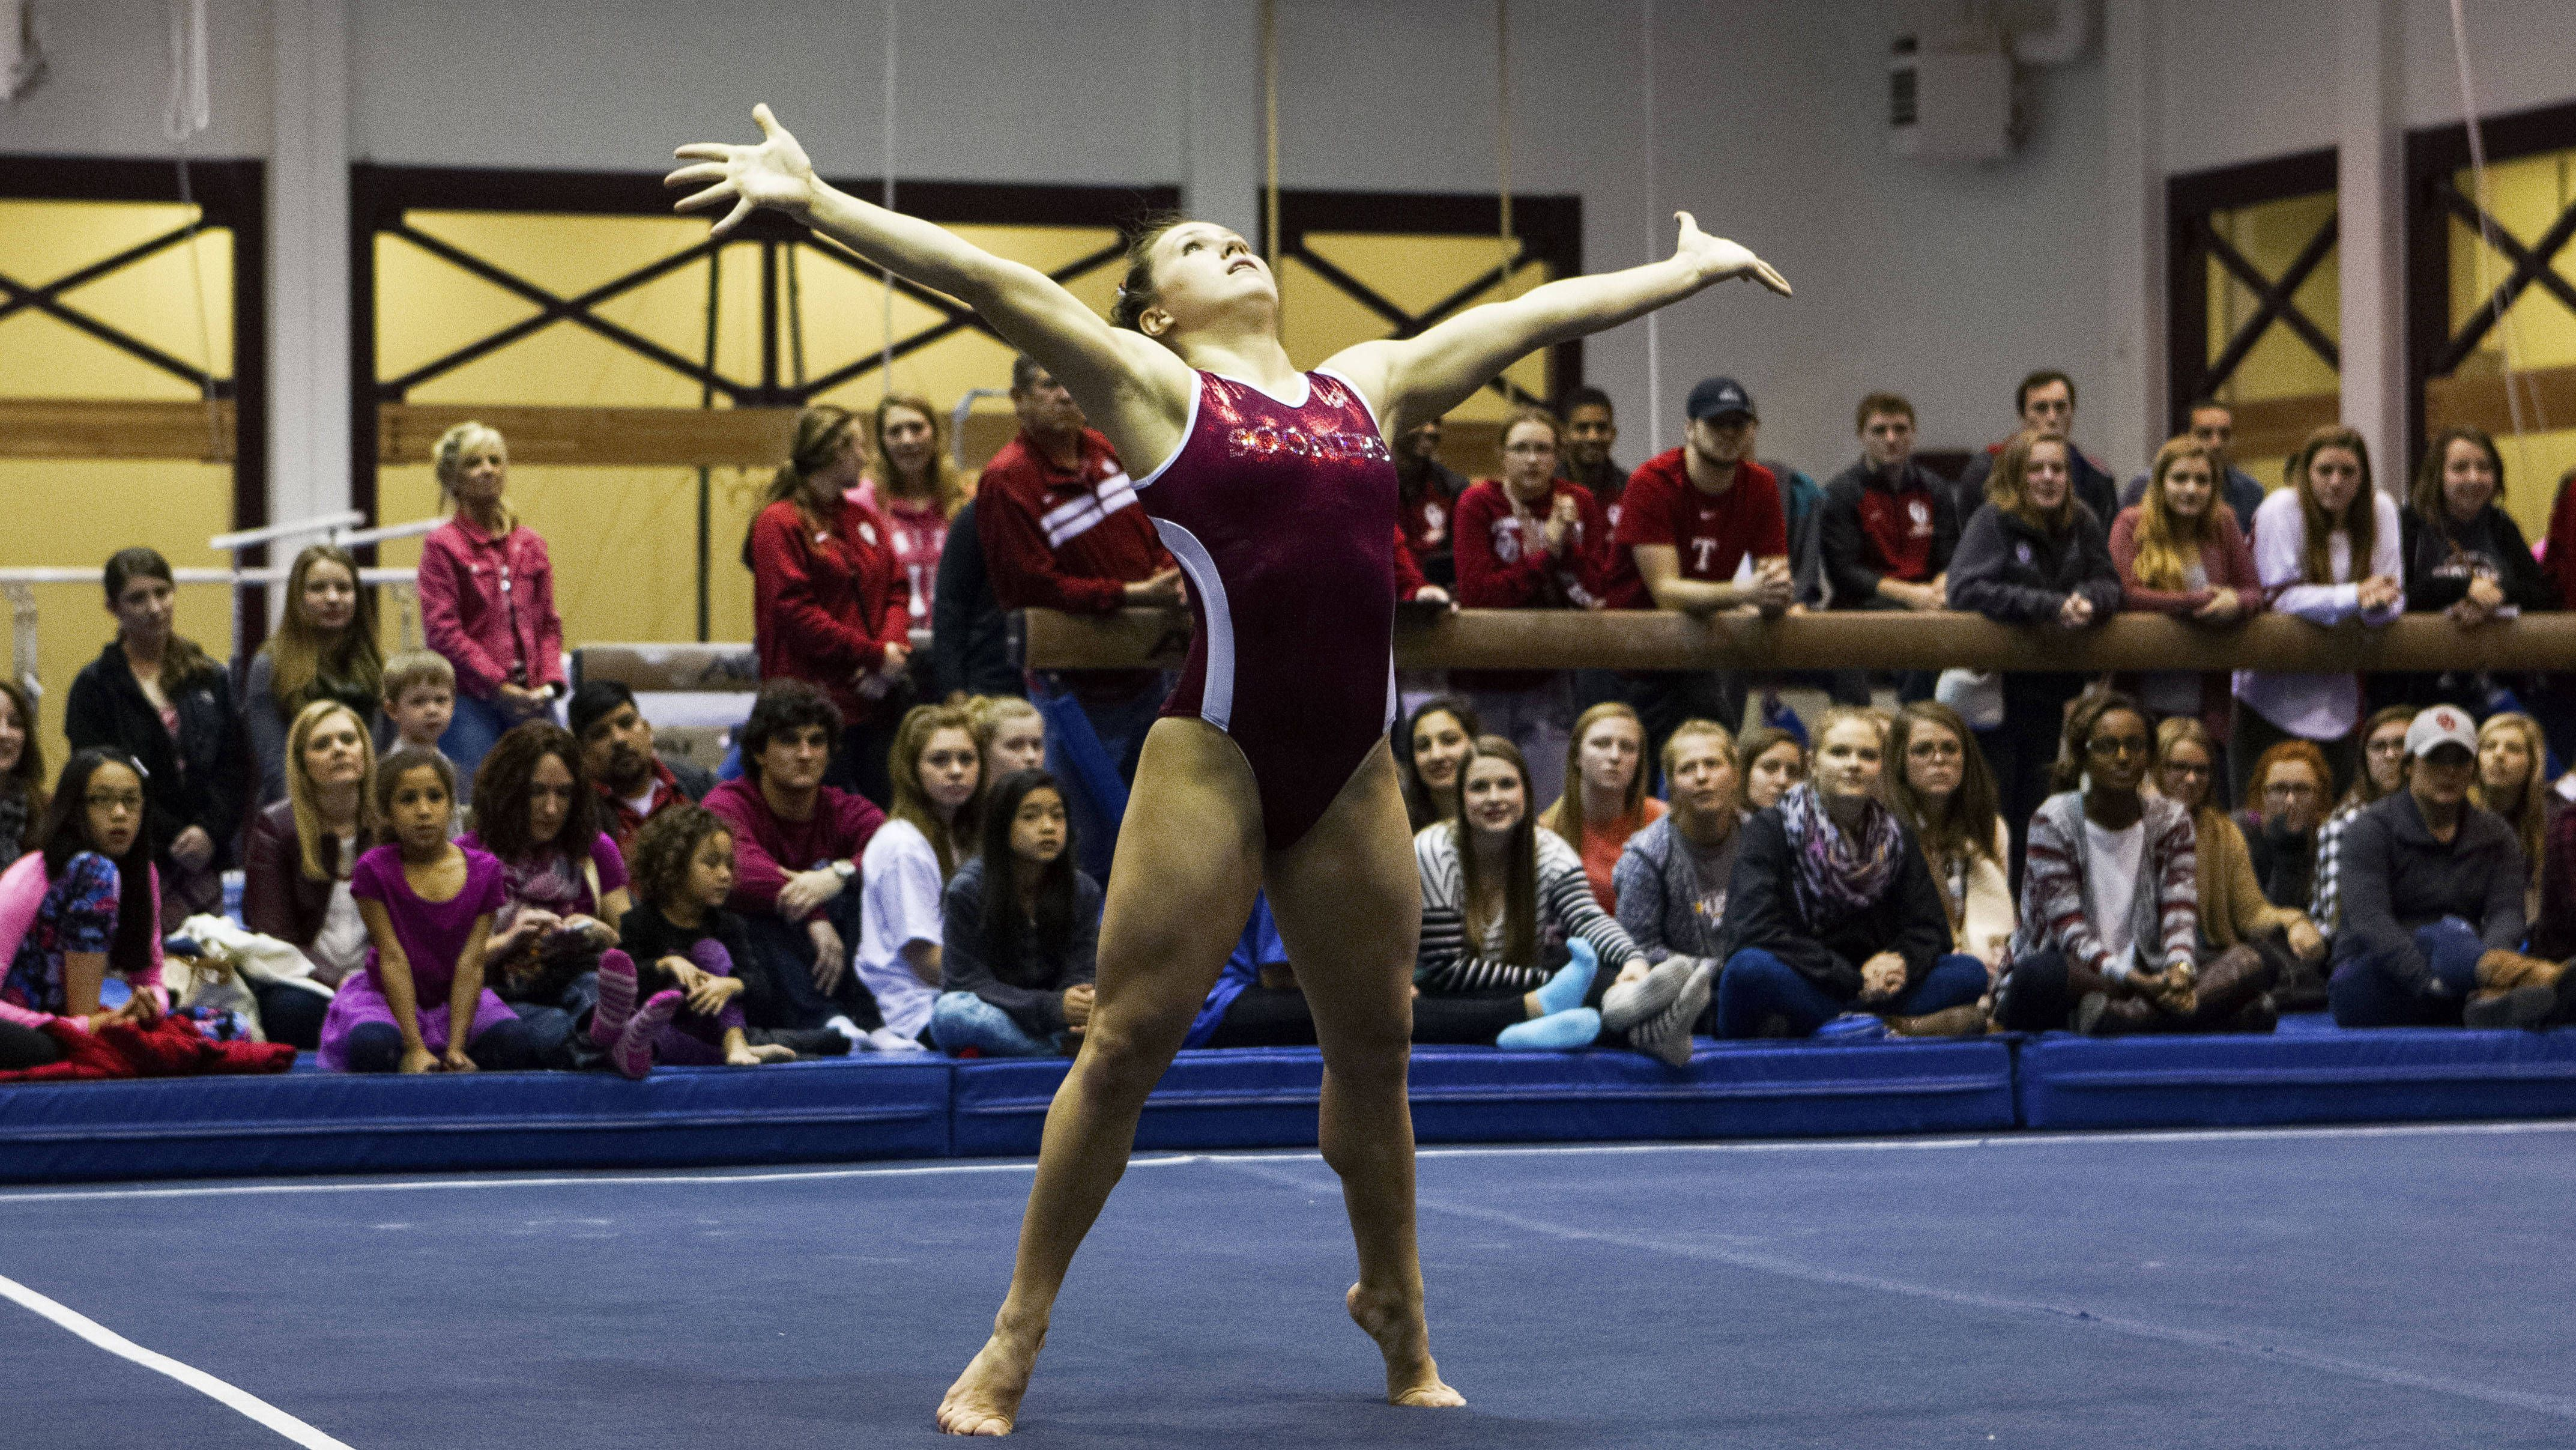 Women's Gymnastics Intrasquad Set for Friday Female